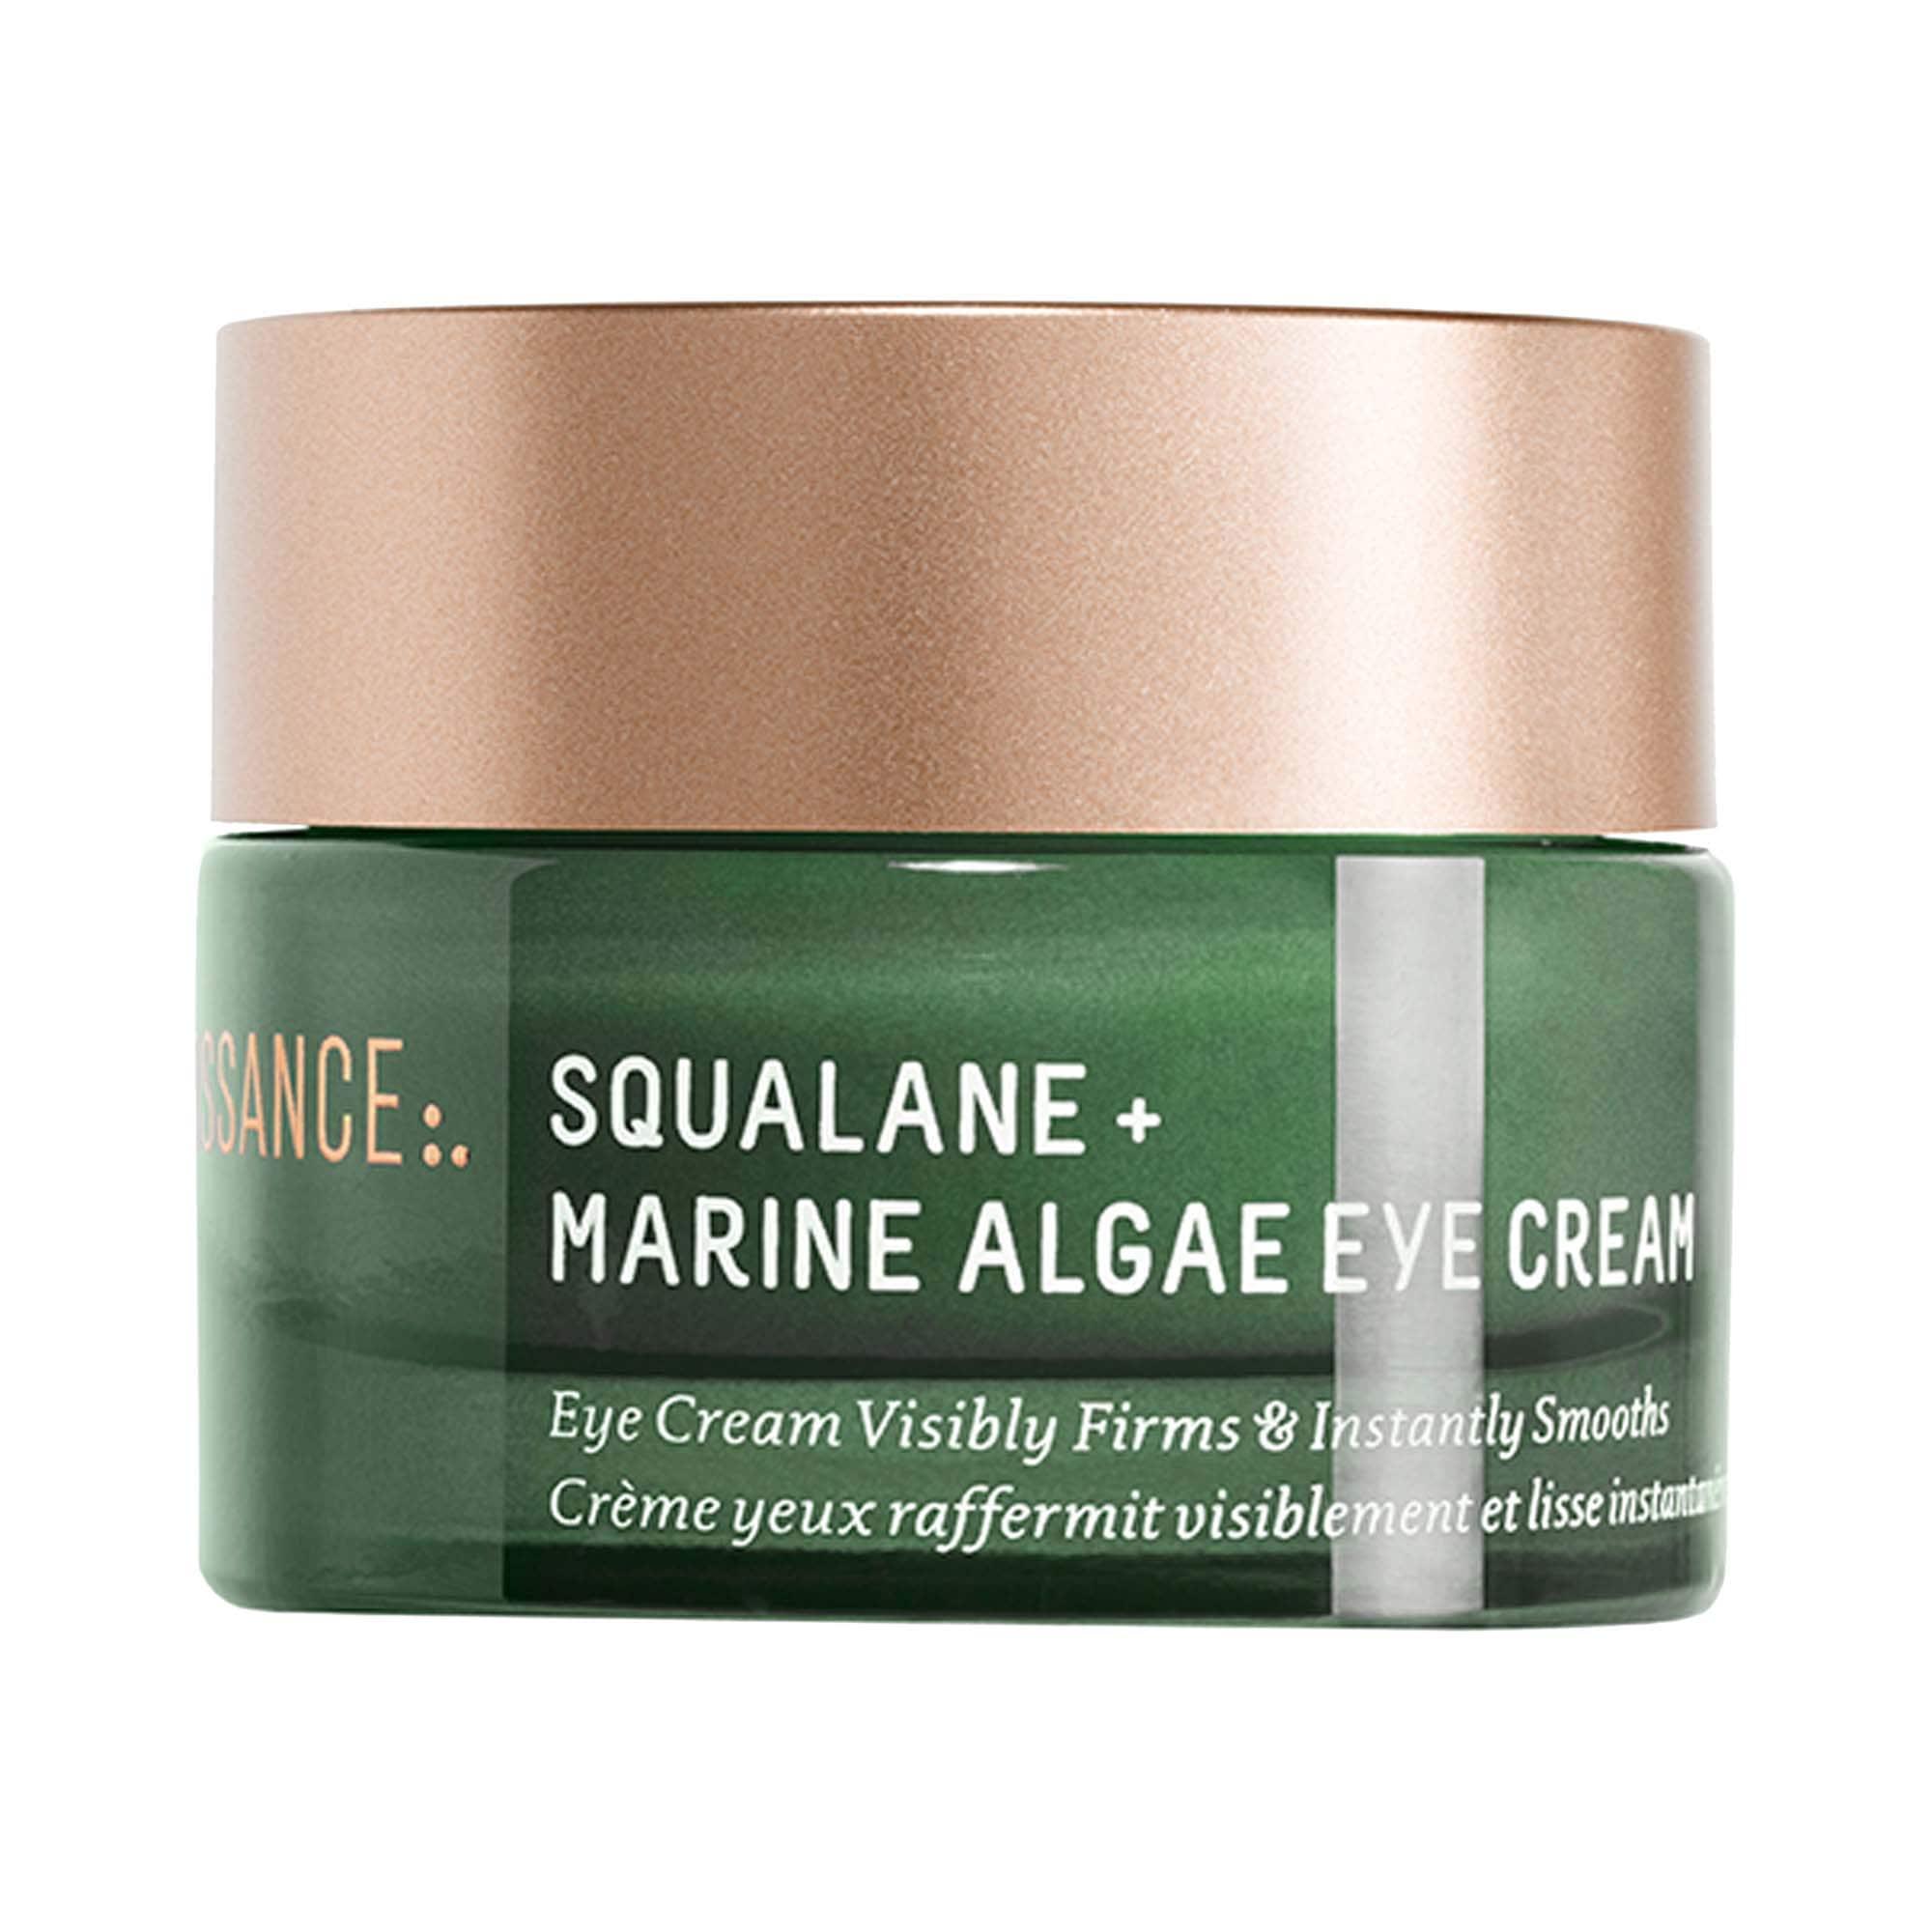 Biossance Squalane + Marine Algae Eye Cream